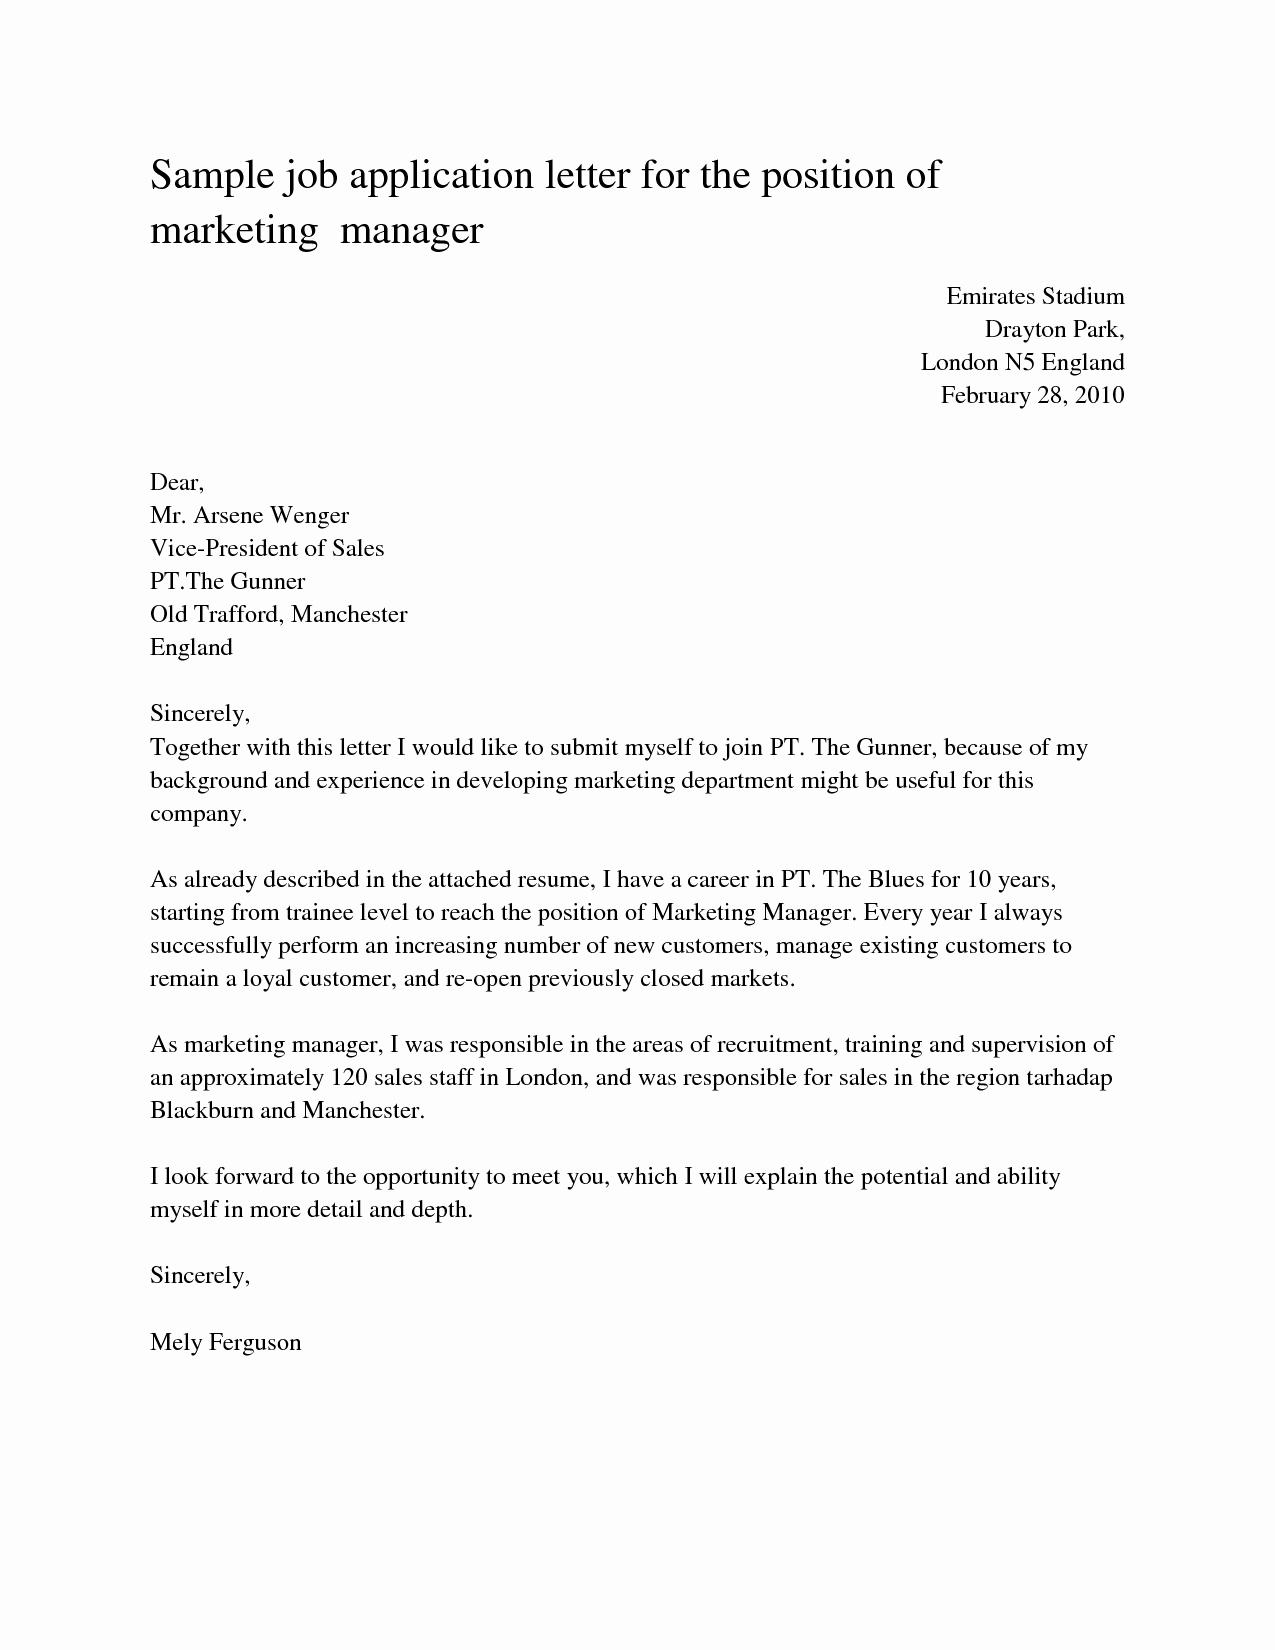 Job Application Letter Sample for the Position